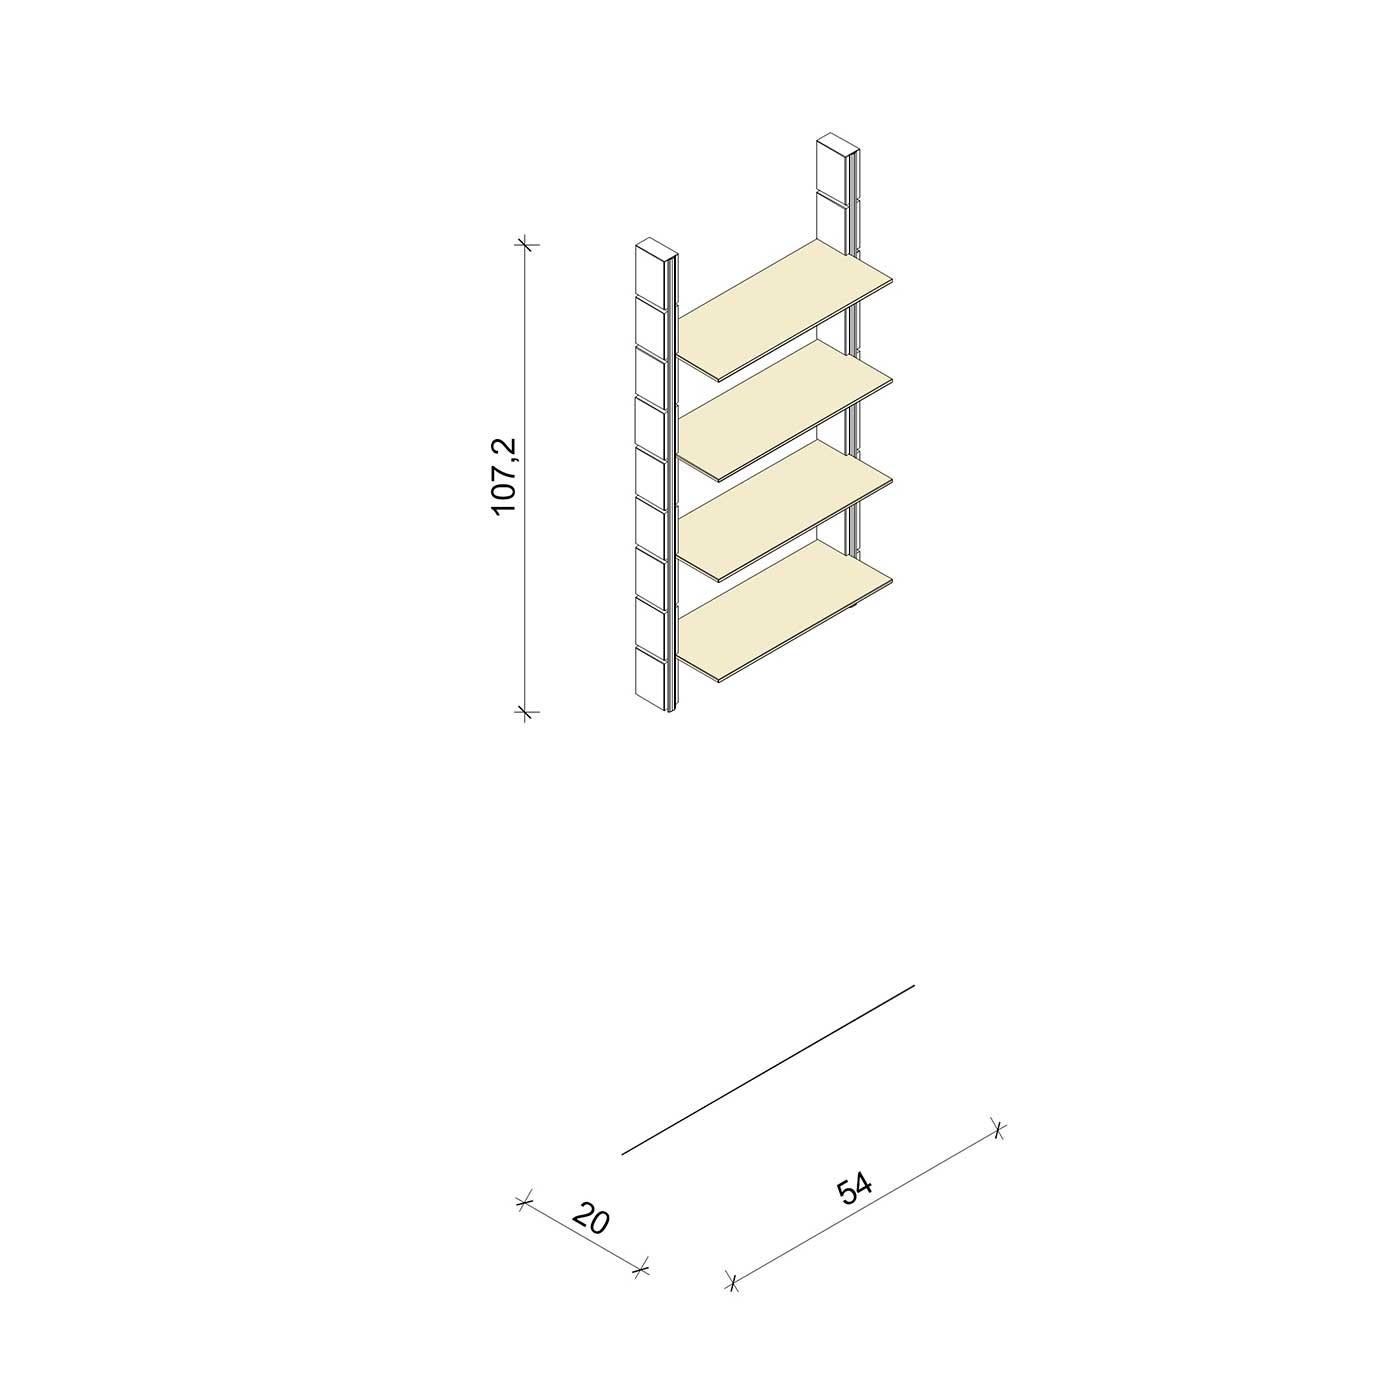 Bücherregal - Basic (M) 54 - Maß: 54 x 107,2 x 20 cm (B x H x T)